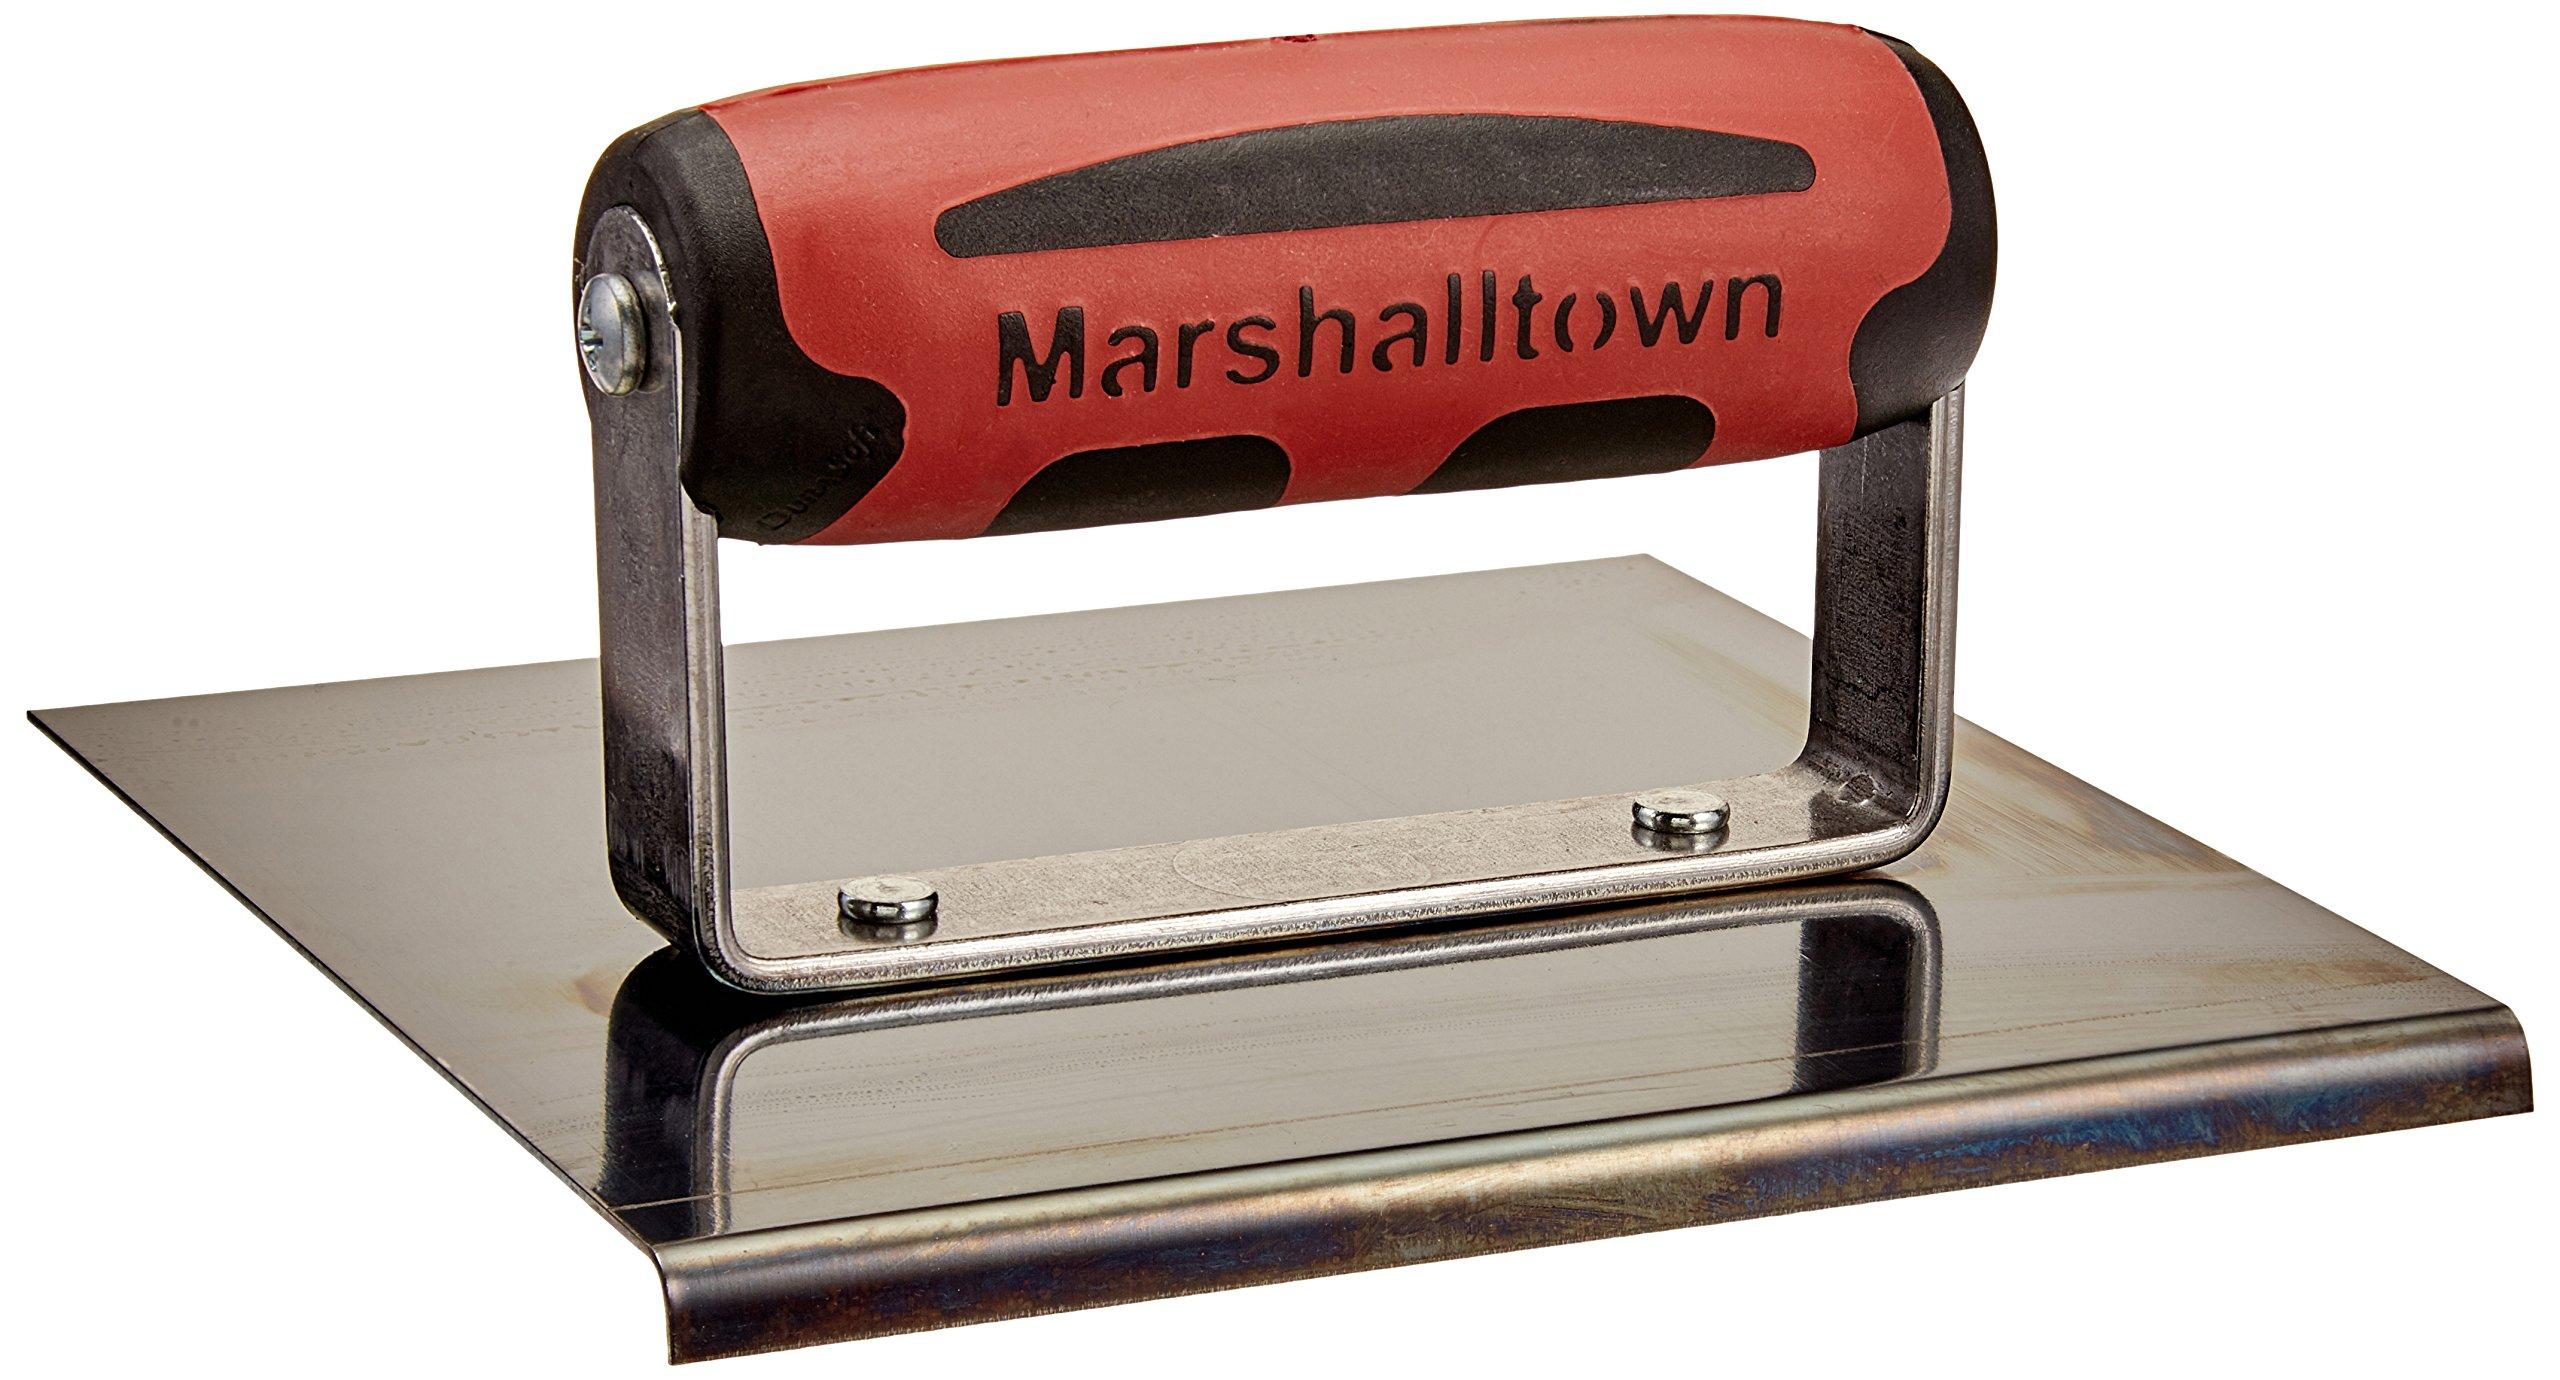 MARSHALLTOWN The Premier Line 161BD 6-Inch x 6-Inch Blue Steel Edger-1/8-Inch Radius, 1/4-Inch Lip DuraSoft Handle